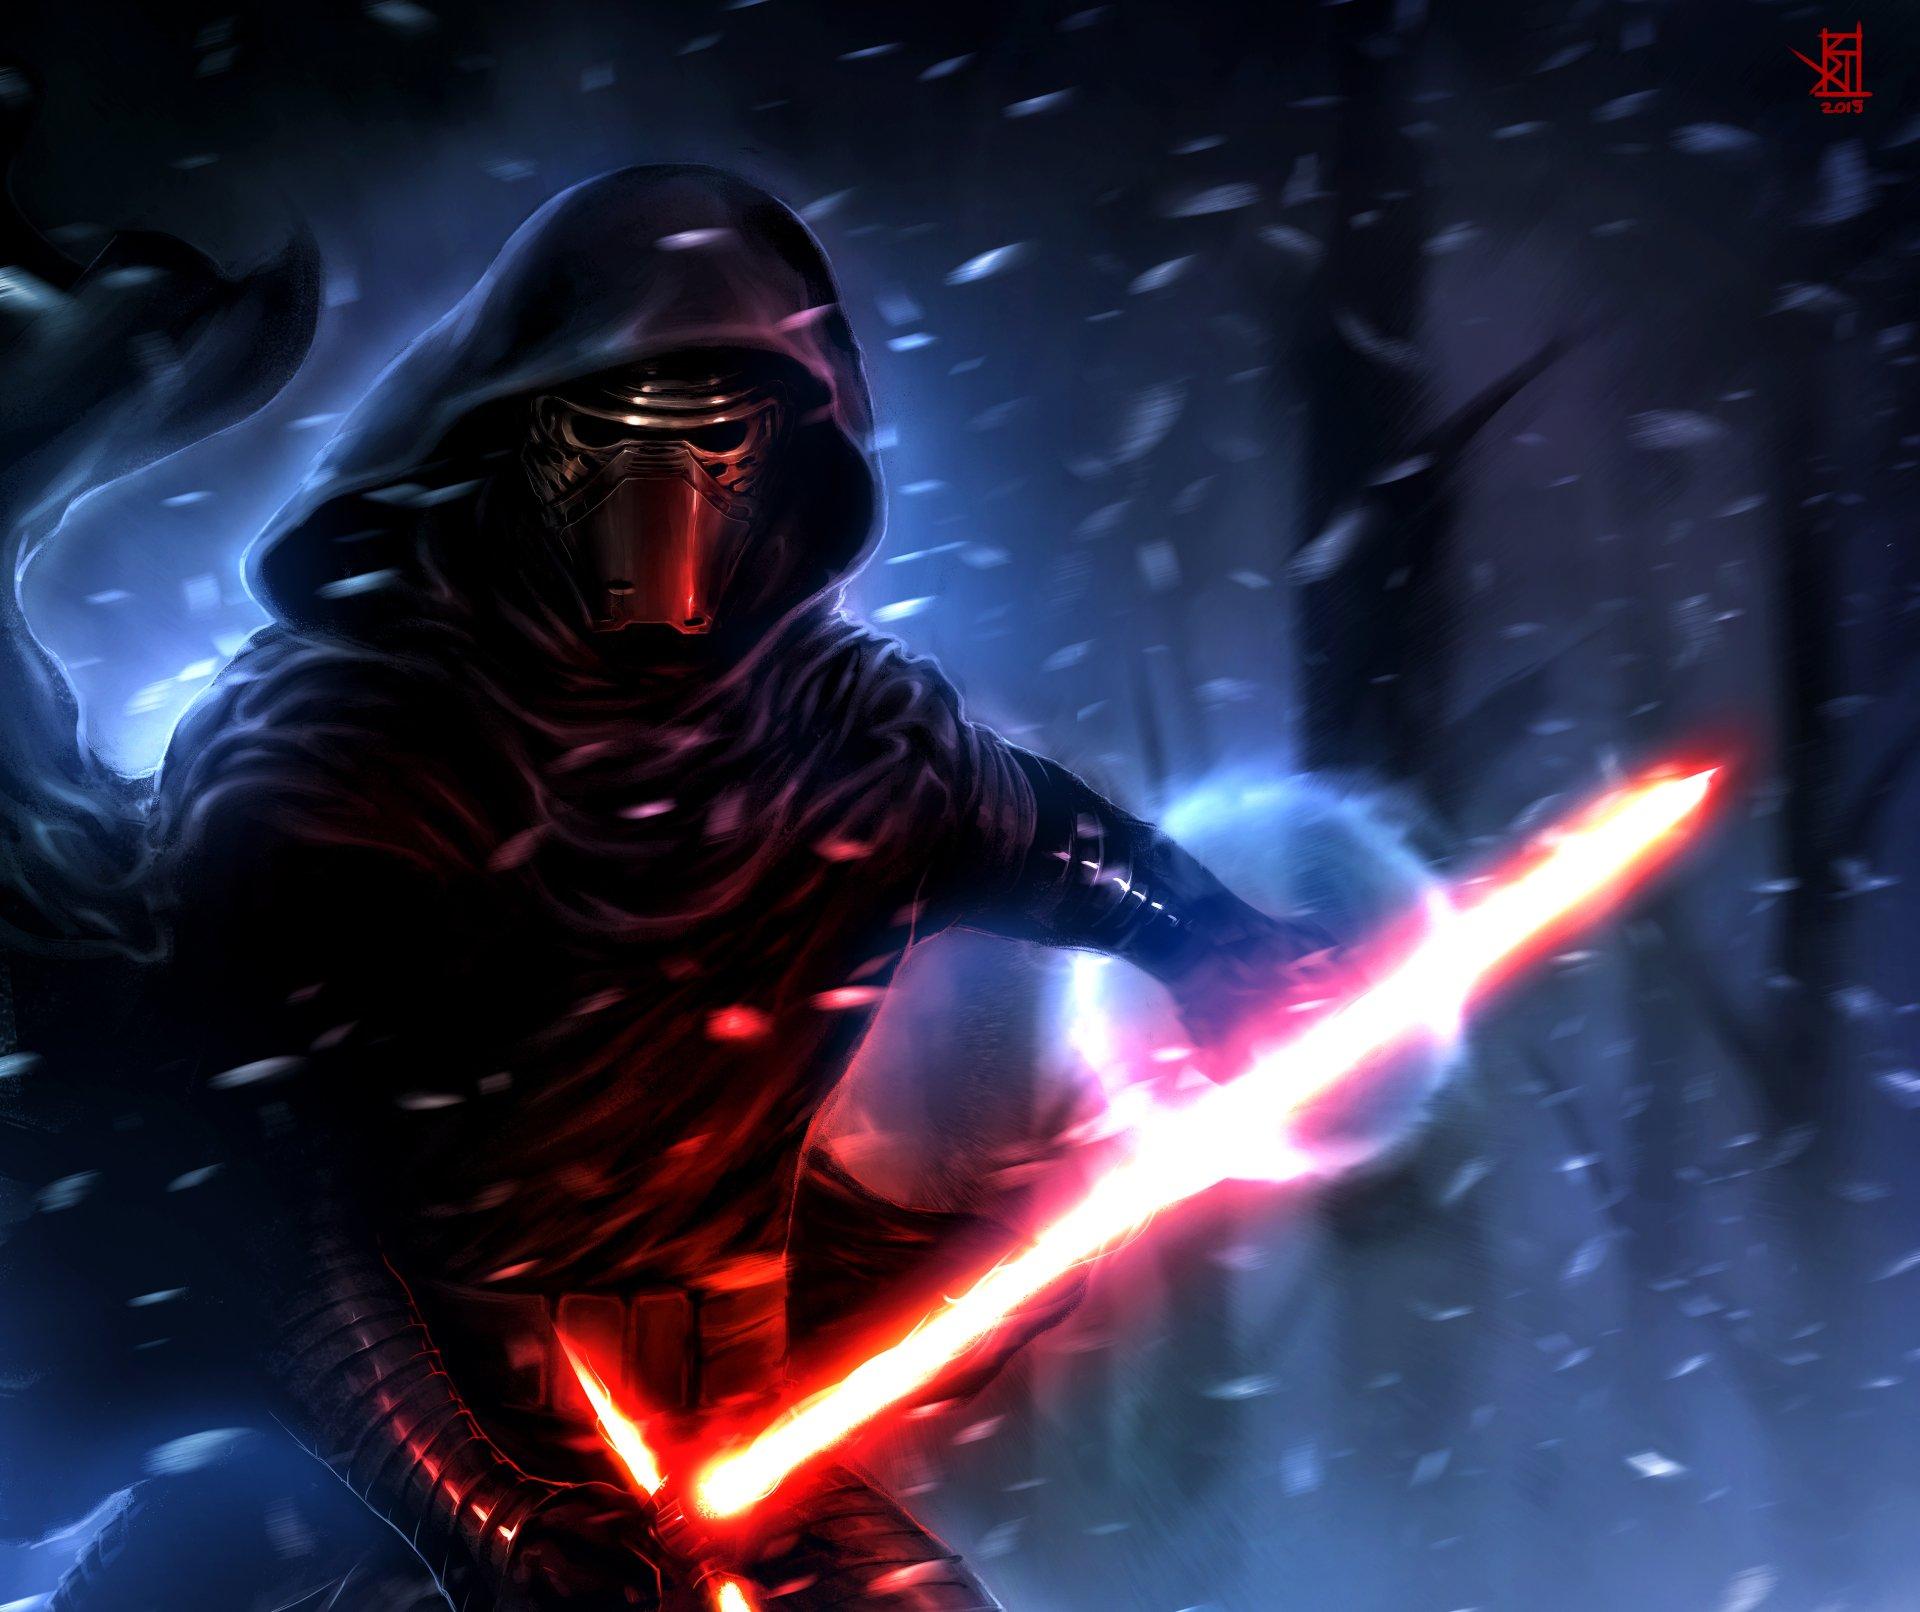 Kylo Ren Wallpaper Iphone X Star Wars Episode Vii The Force Awakens Hd Wallpaper